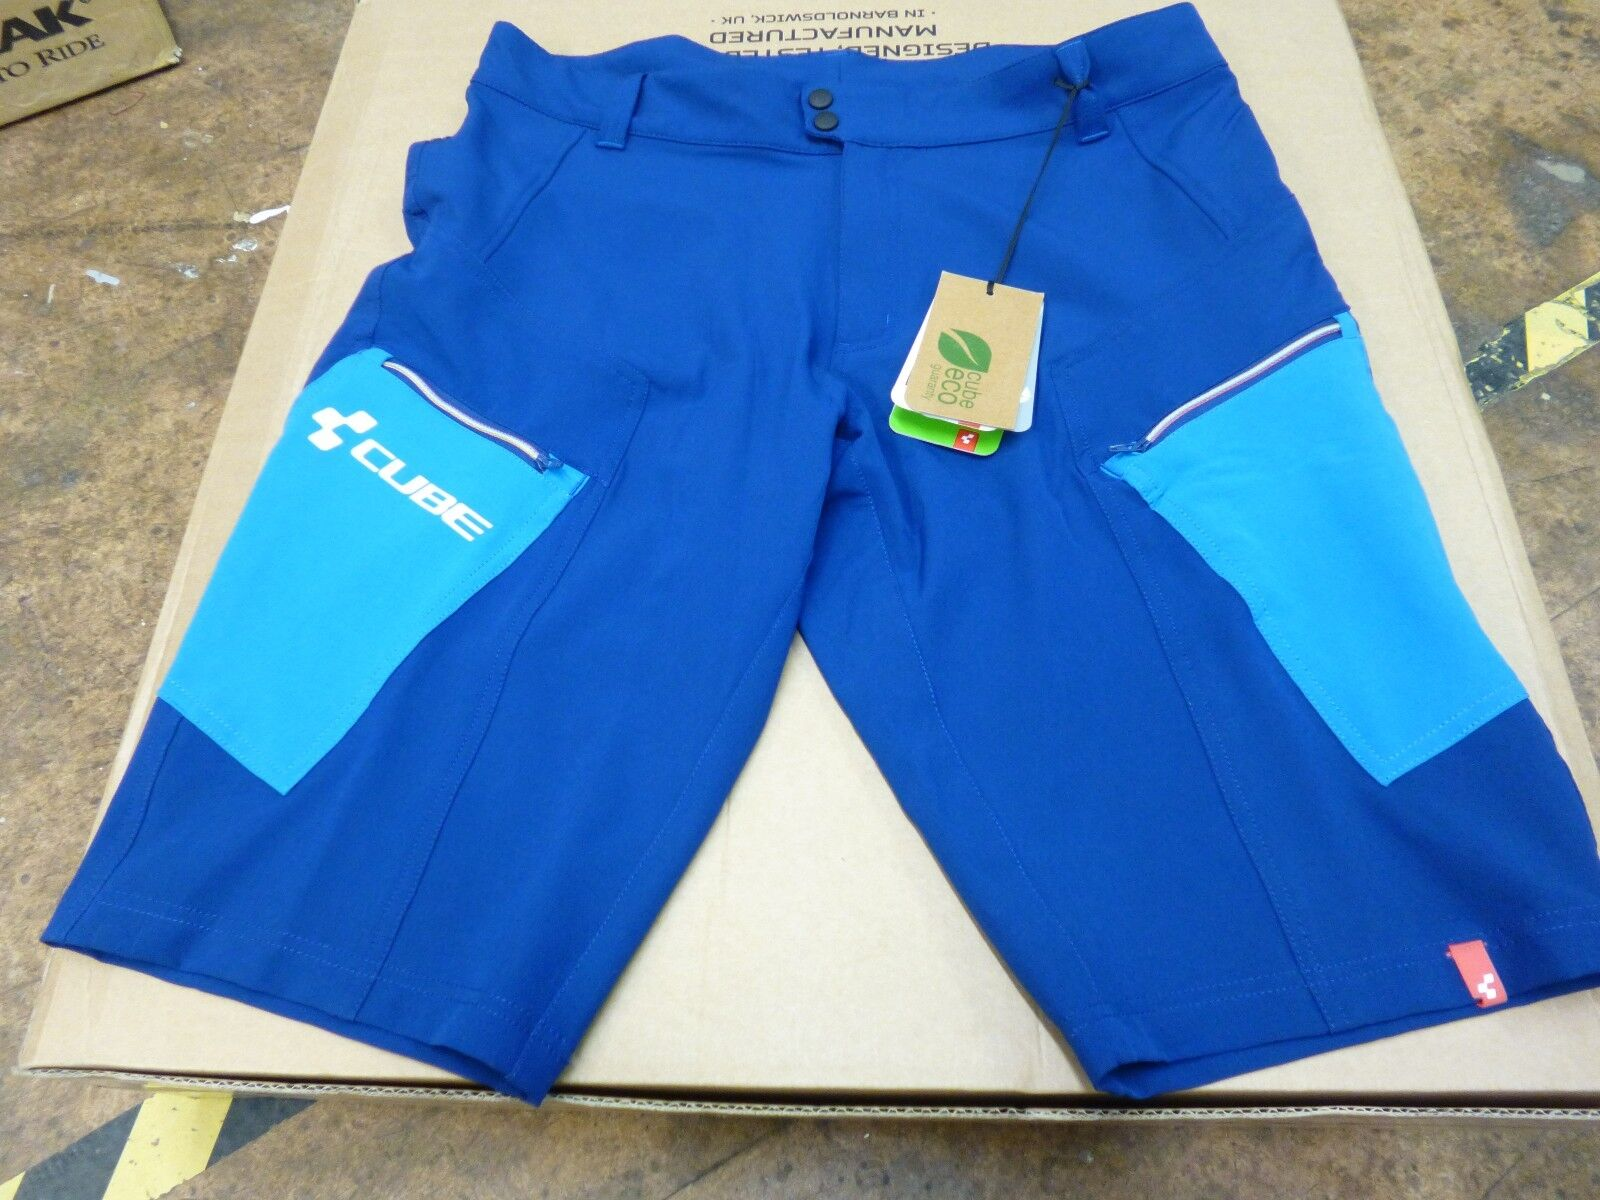 Cube Tour Cycling Shorts, bluee, BNWT